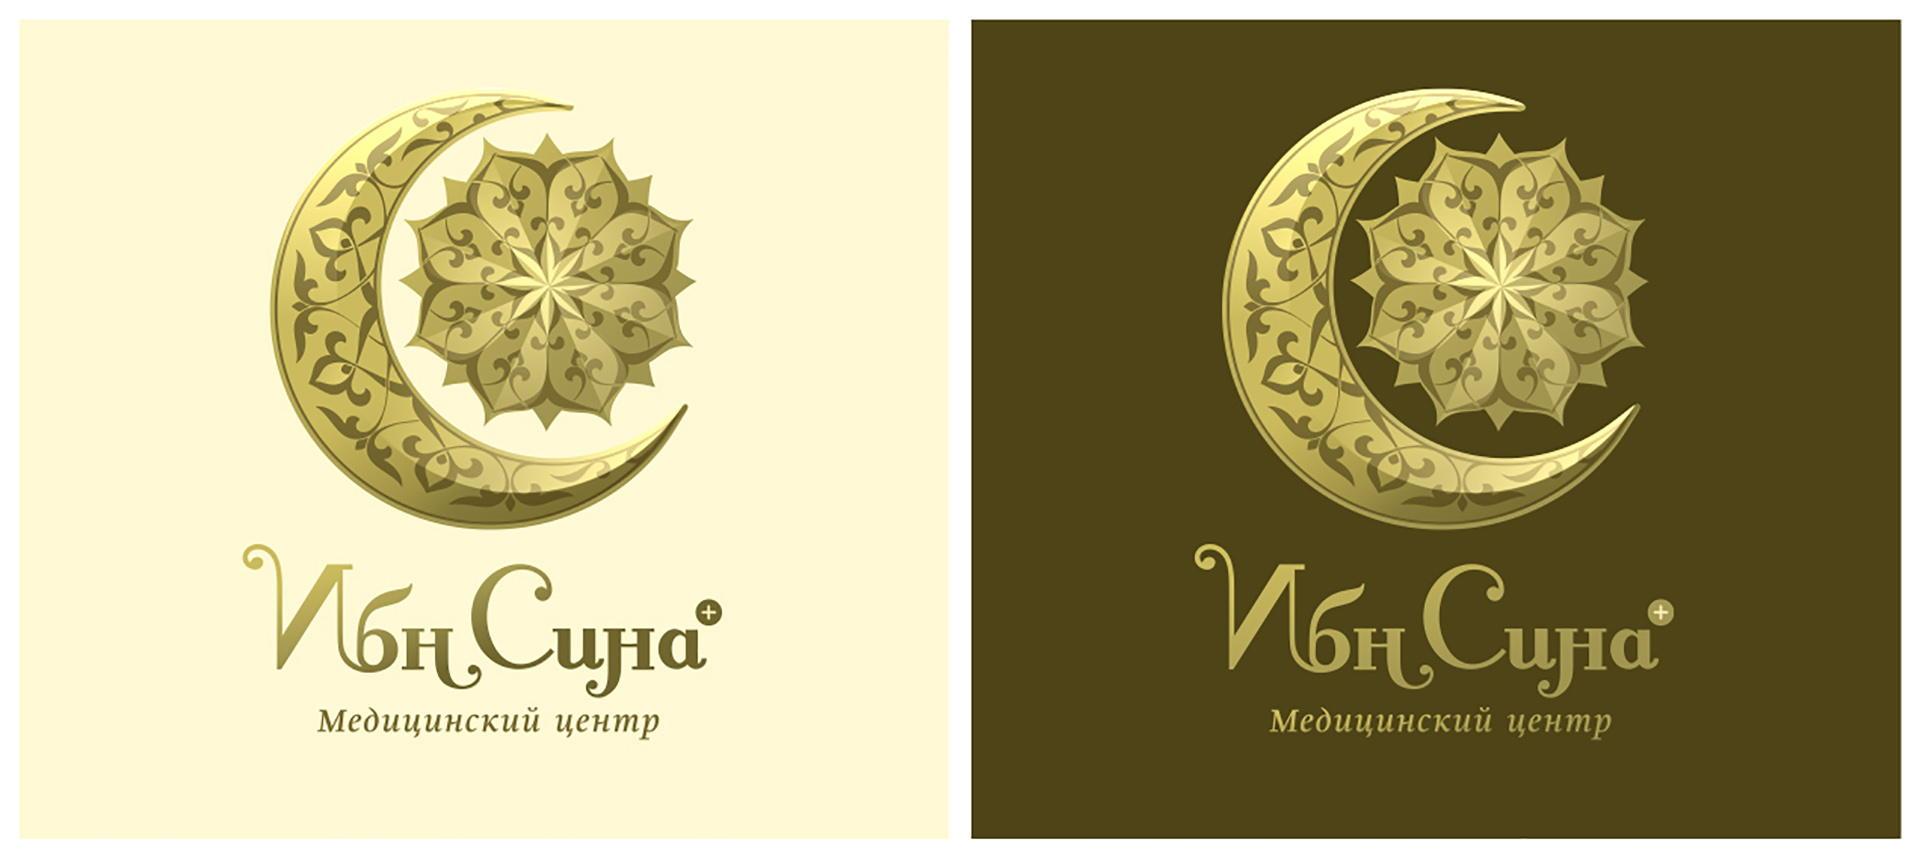 Разработка логотипа медицинского центра Development of the medical center logo